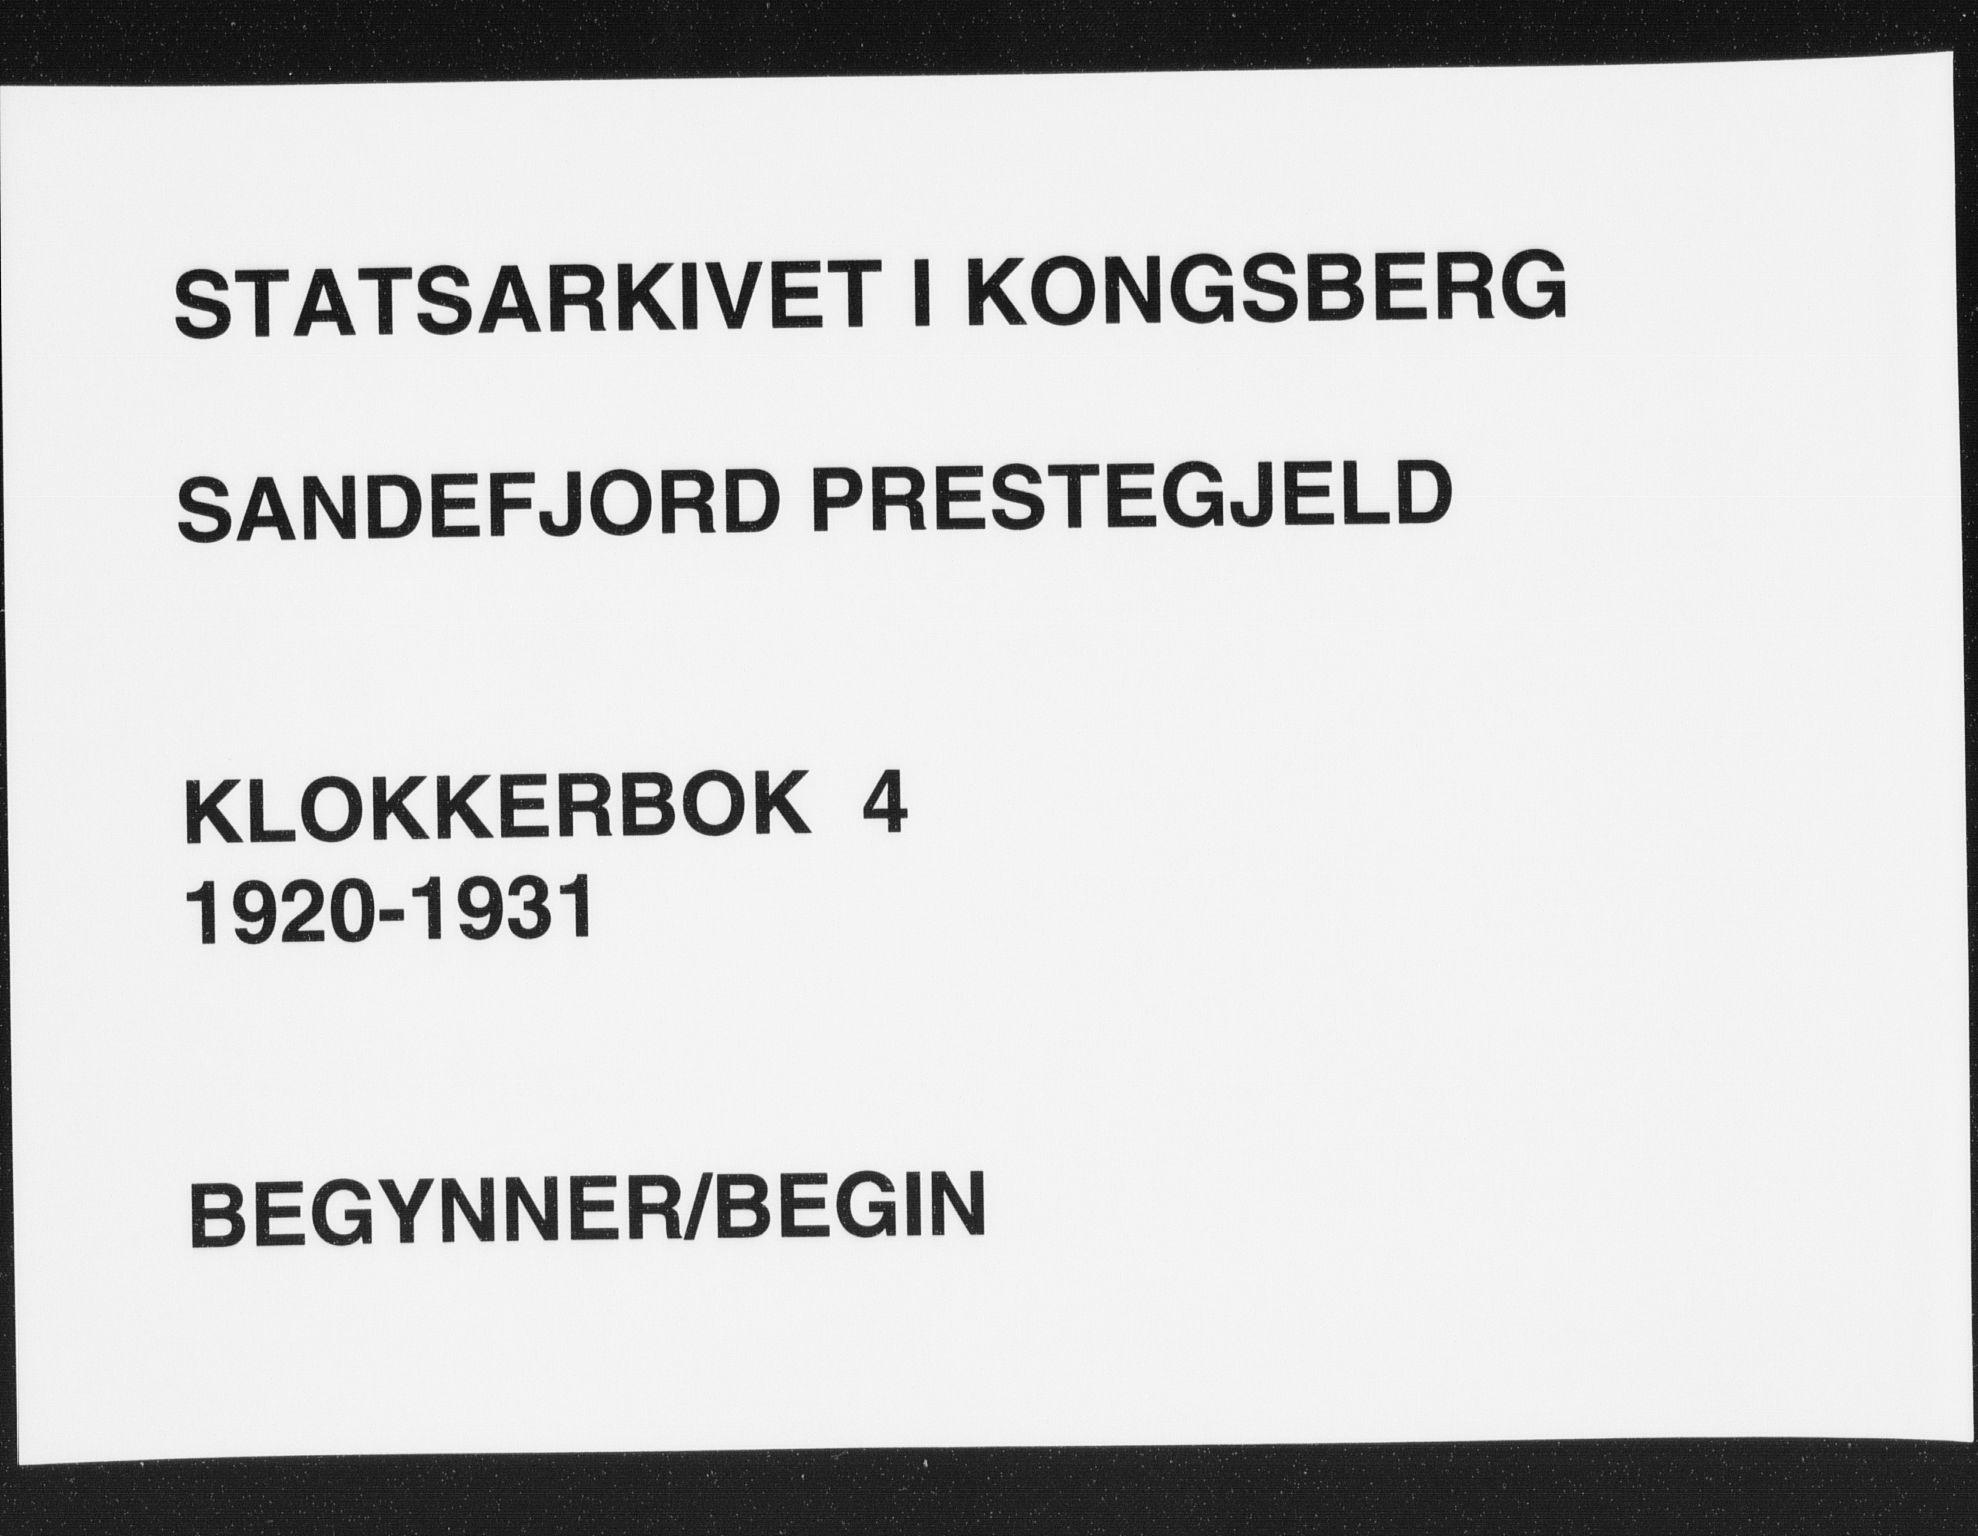 SAKO, Sandefjord kirkebøker, G/Ga/L0004: Klokkerbok nr. 4, 1920-1931